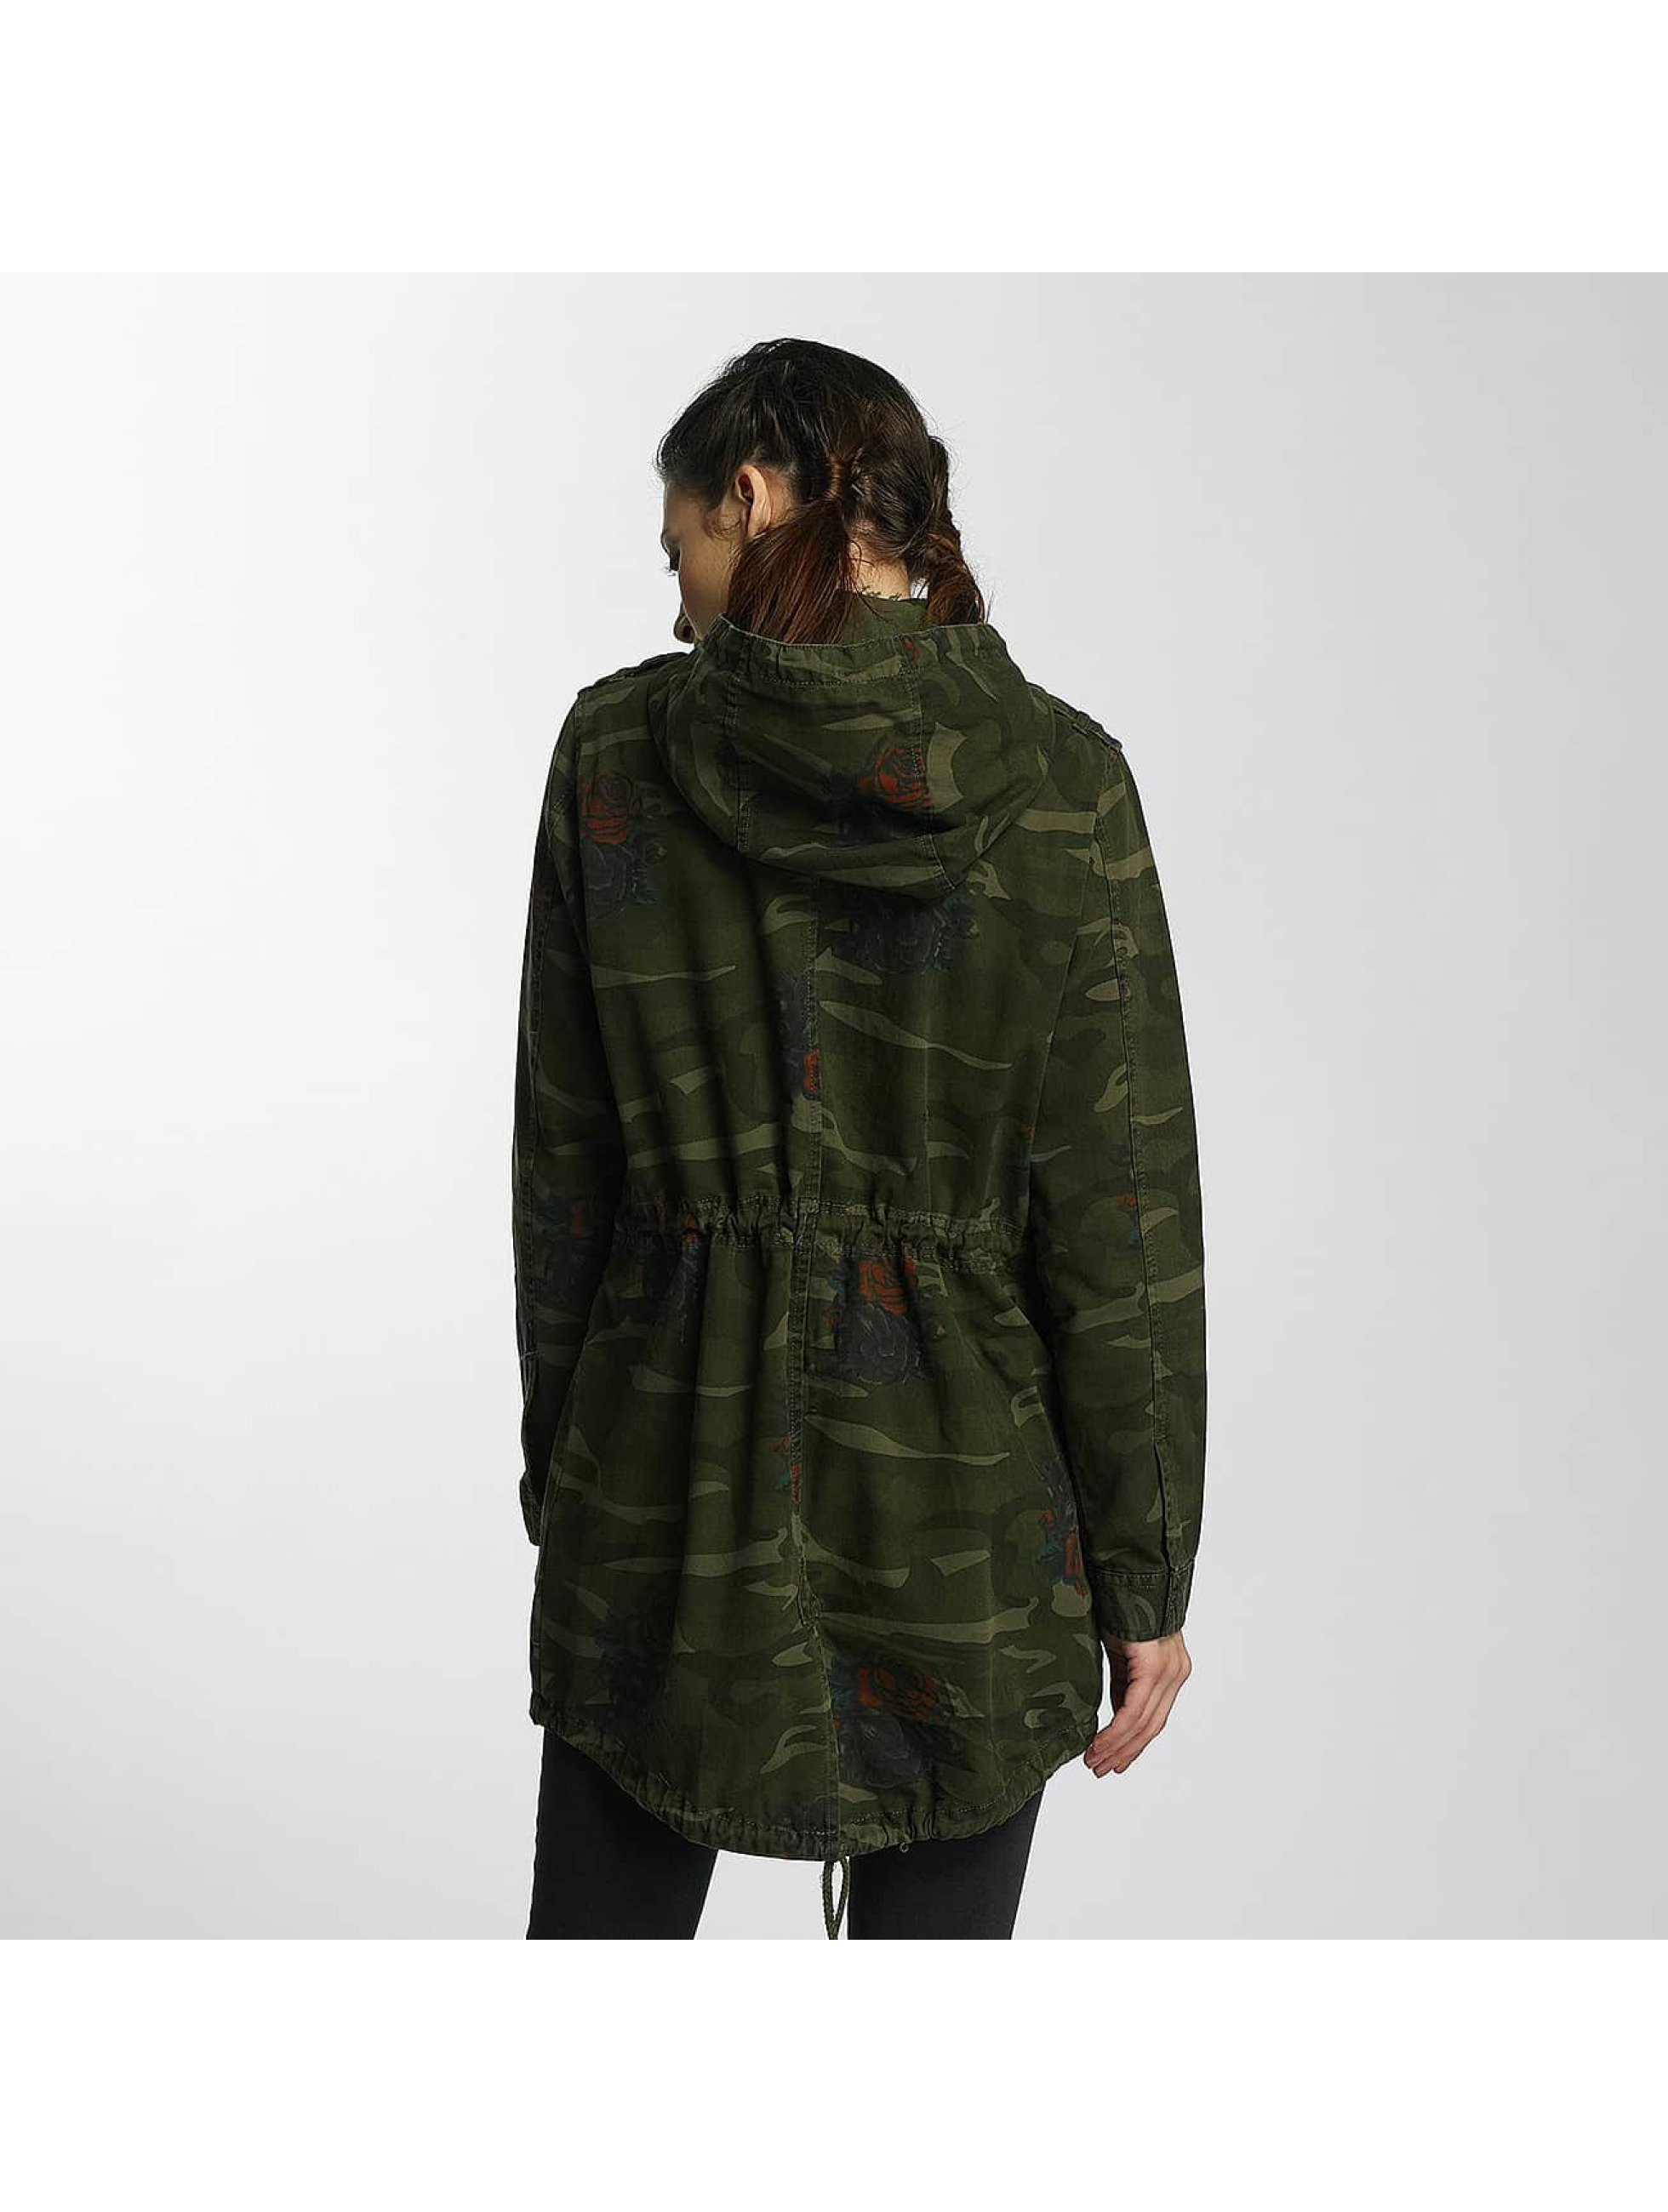 Brave Soul Демисезонная куртка Hooded Cotton Twill Unlined камуфляж